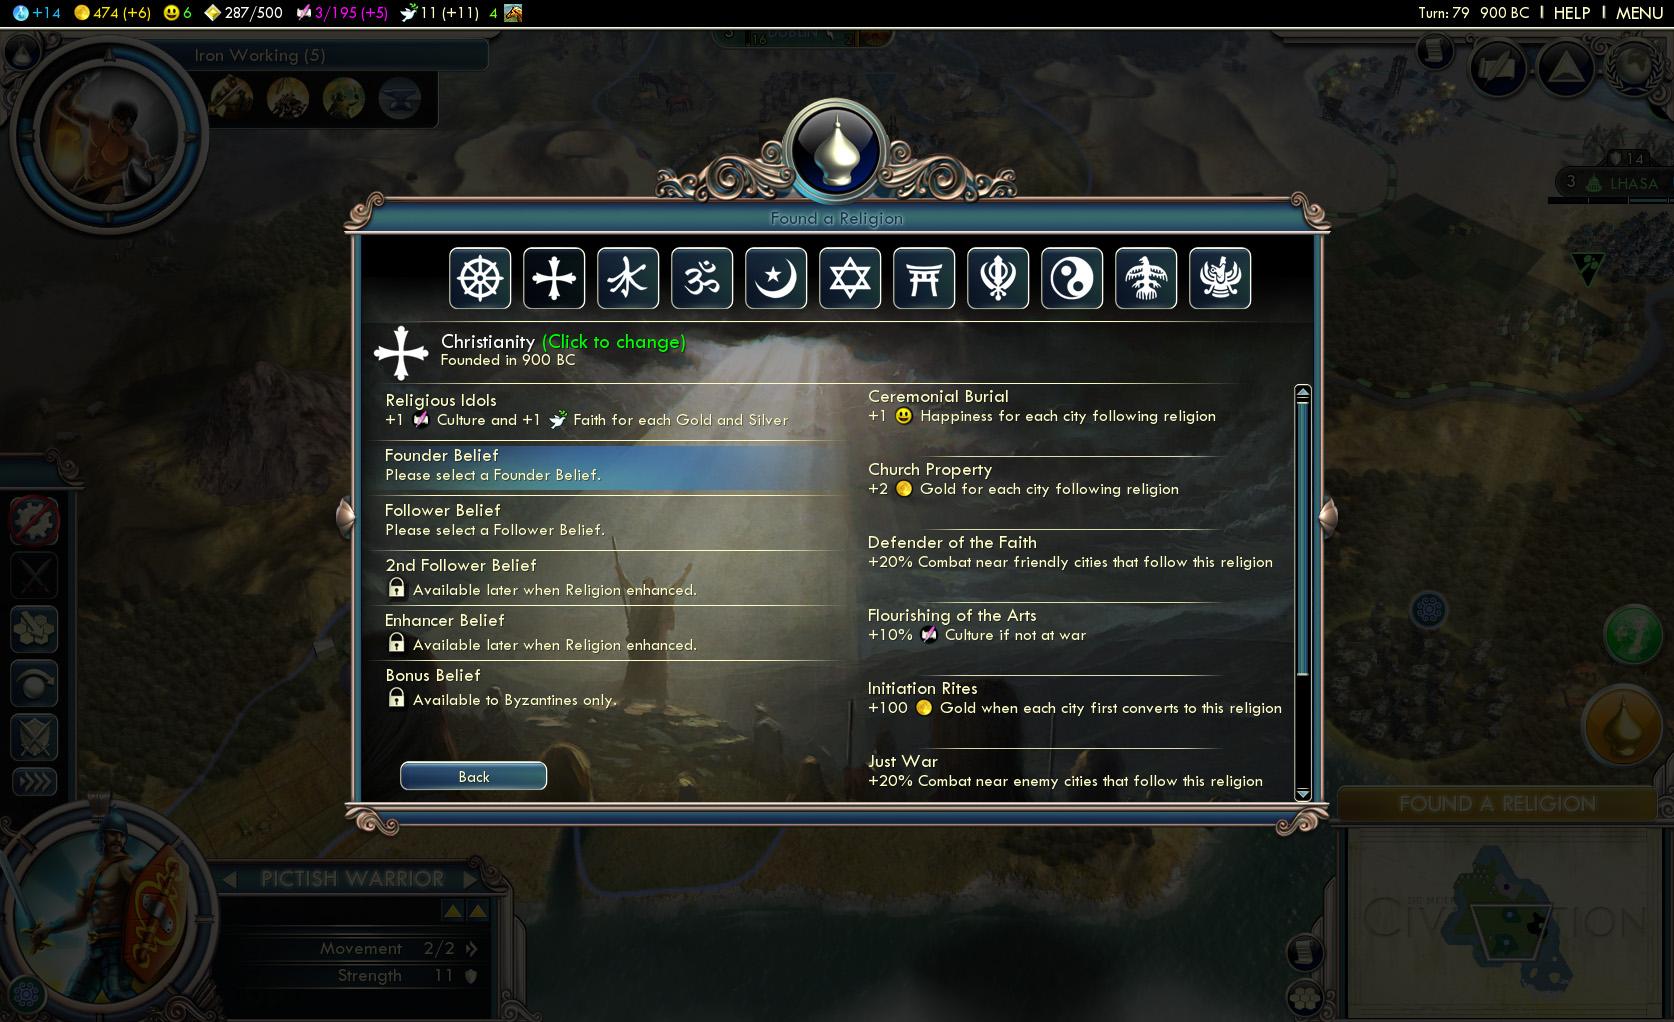 SidMeier-sCivilizationV-Gods-Kings PC News 002